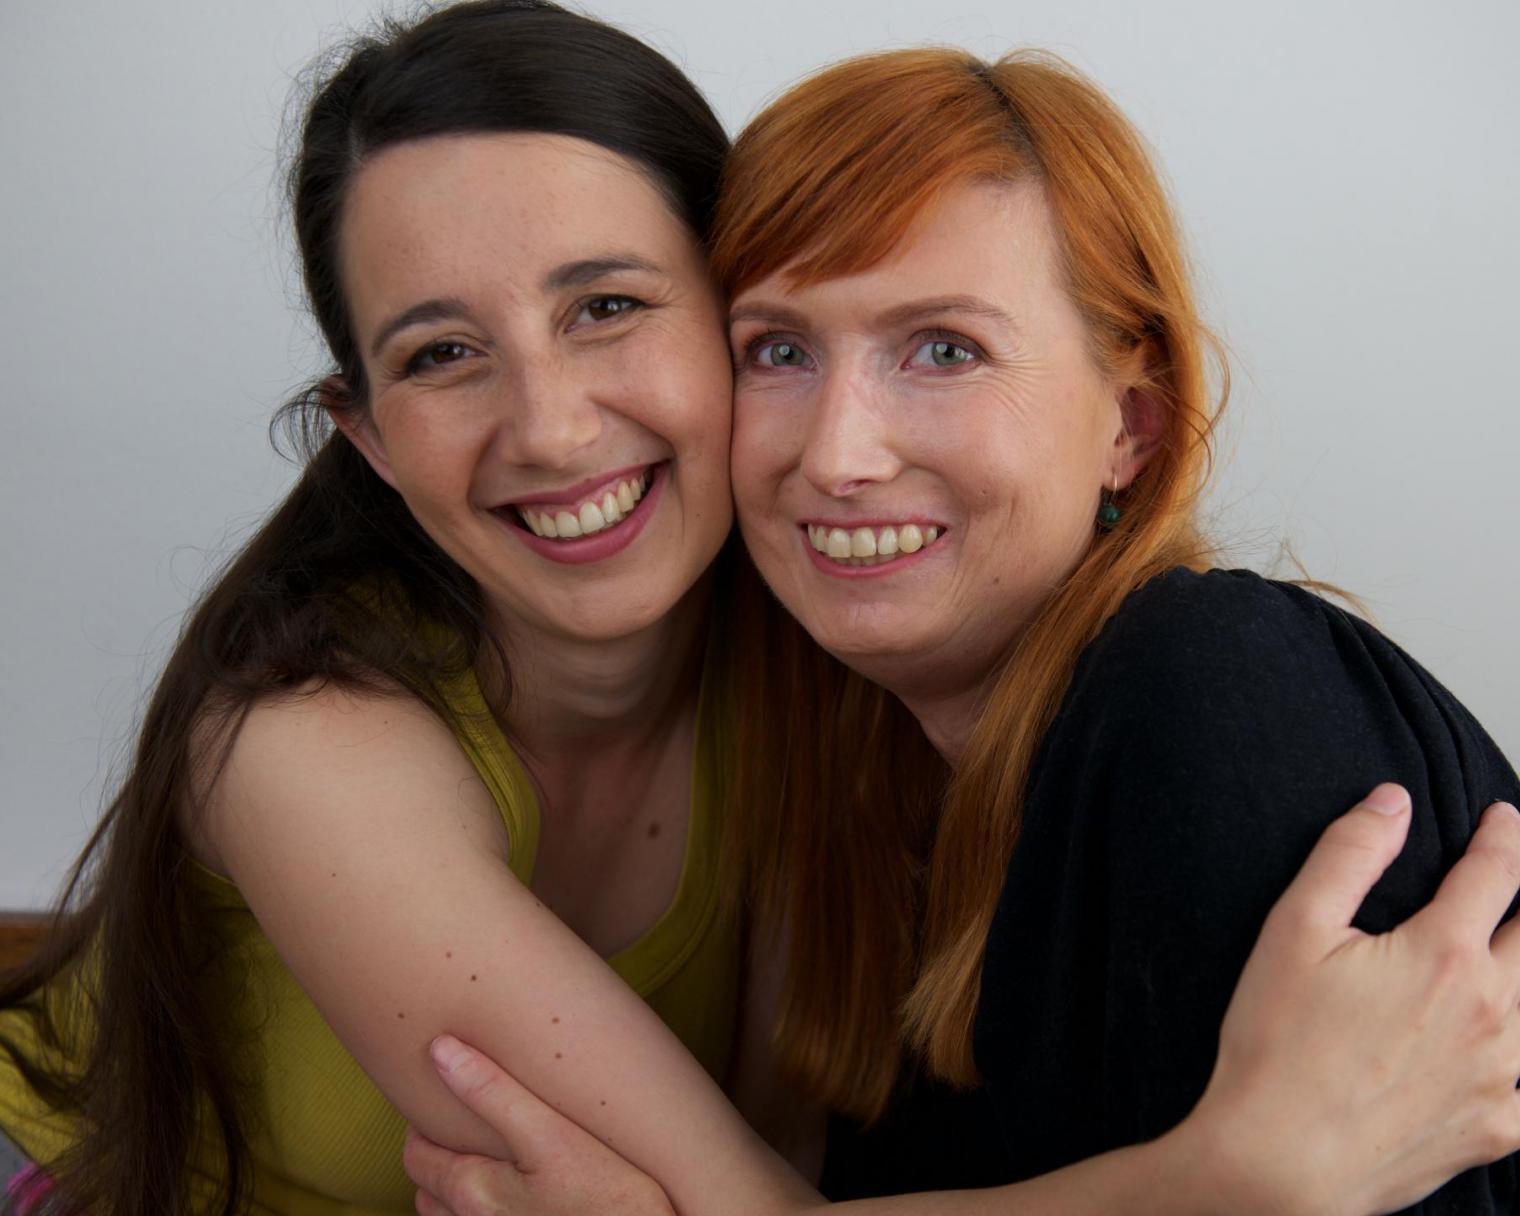 Two ladies taking a friendly selfie